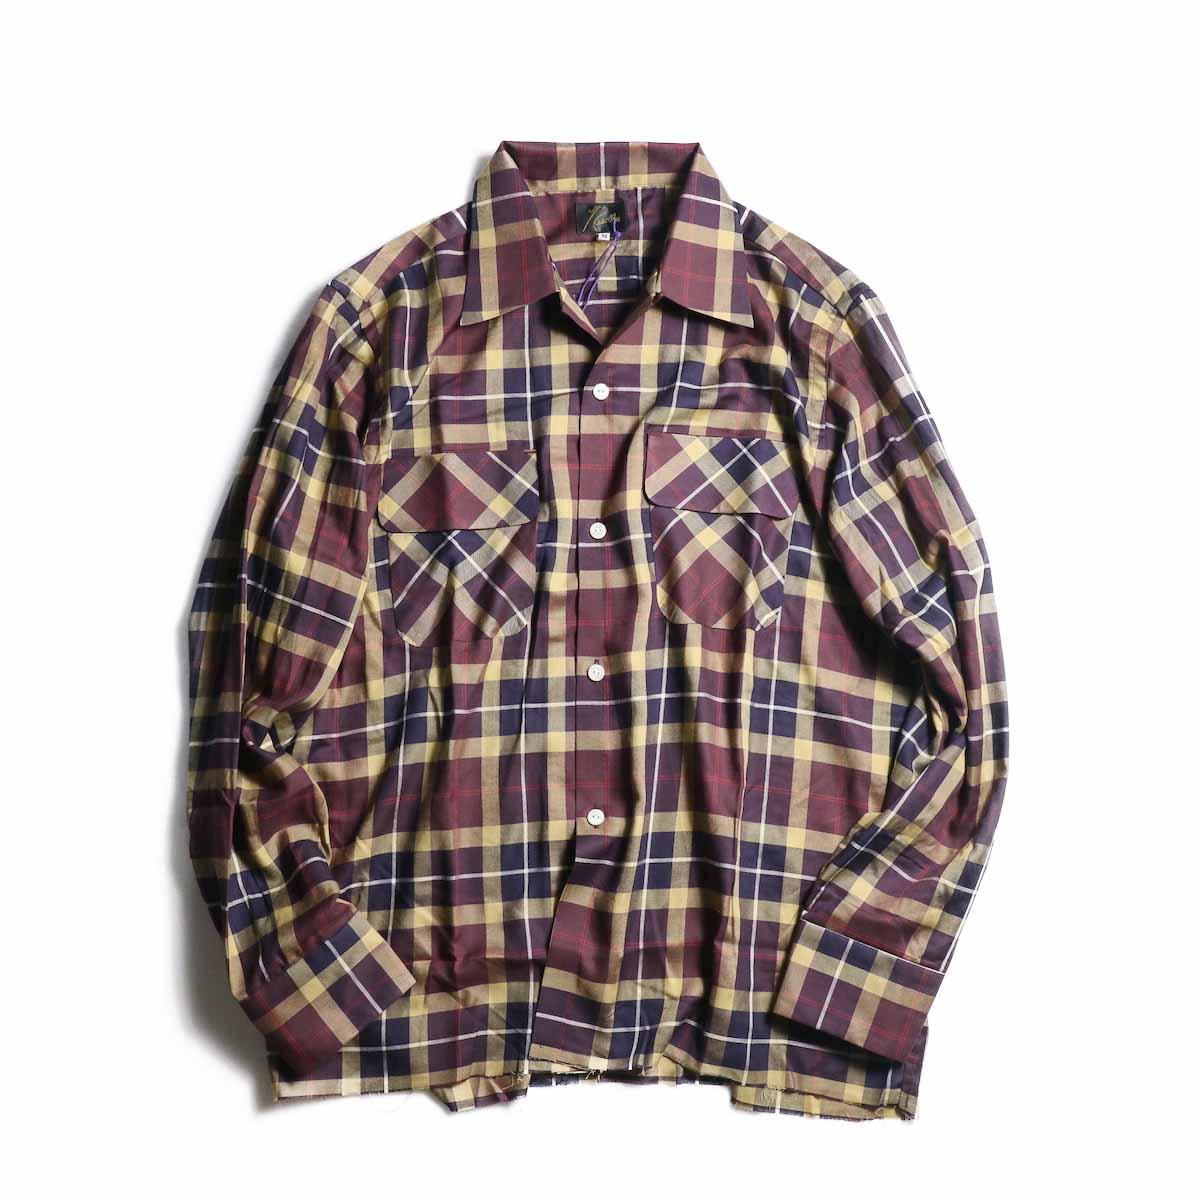 NEEDLES / Cut-Off Bottom Classic Shirt -r/c Plaid Twill (Bordeaux)